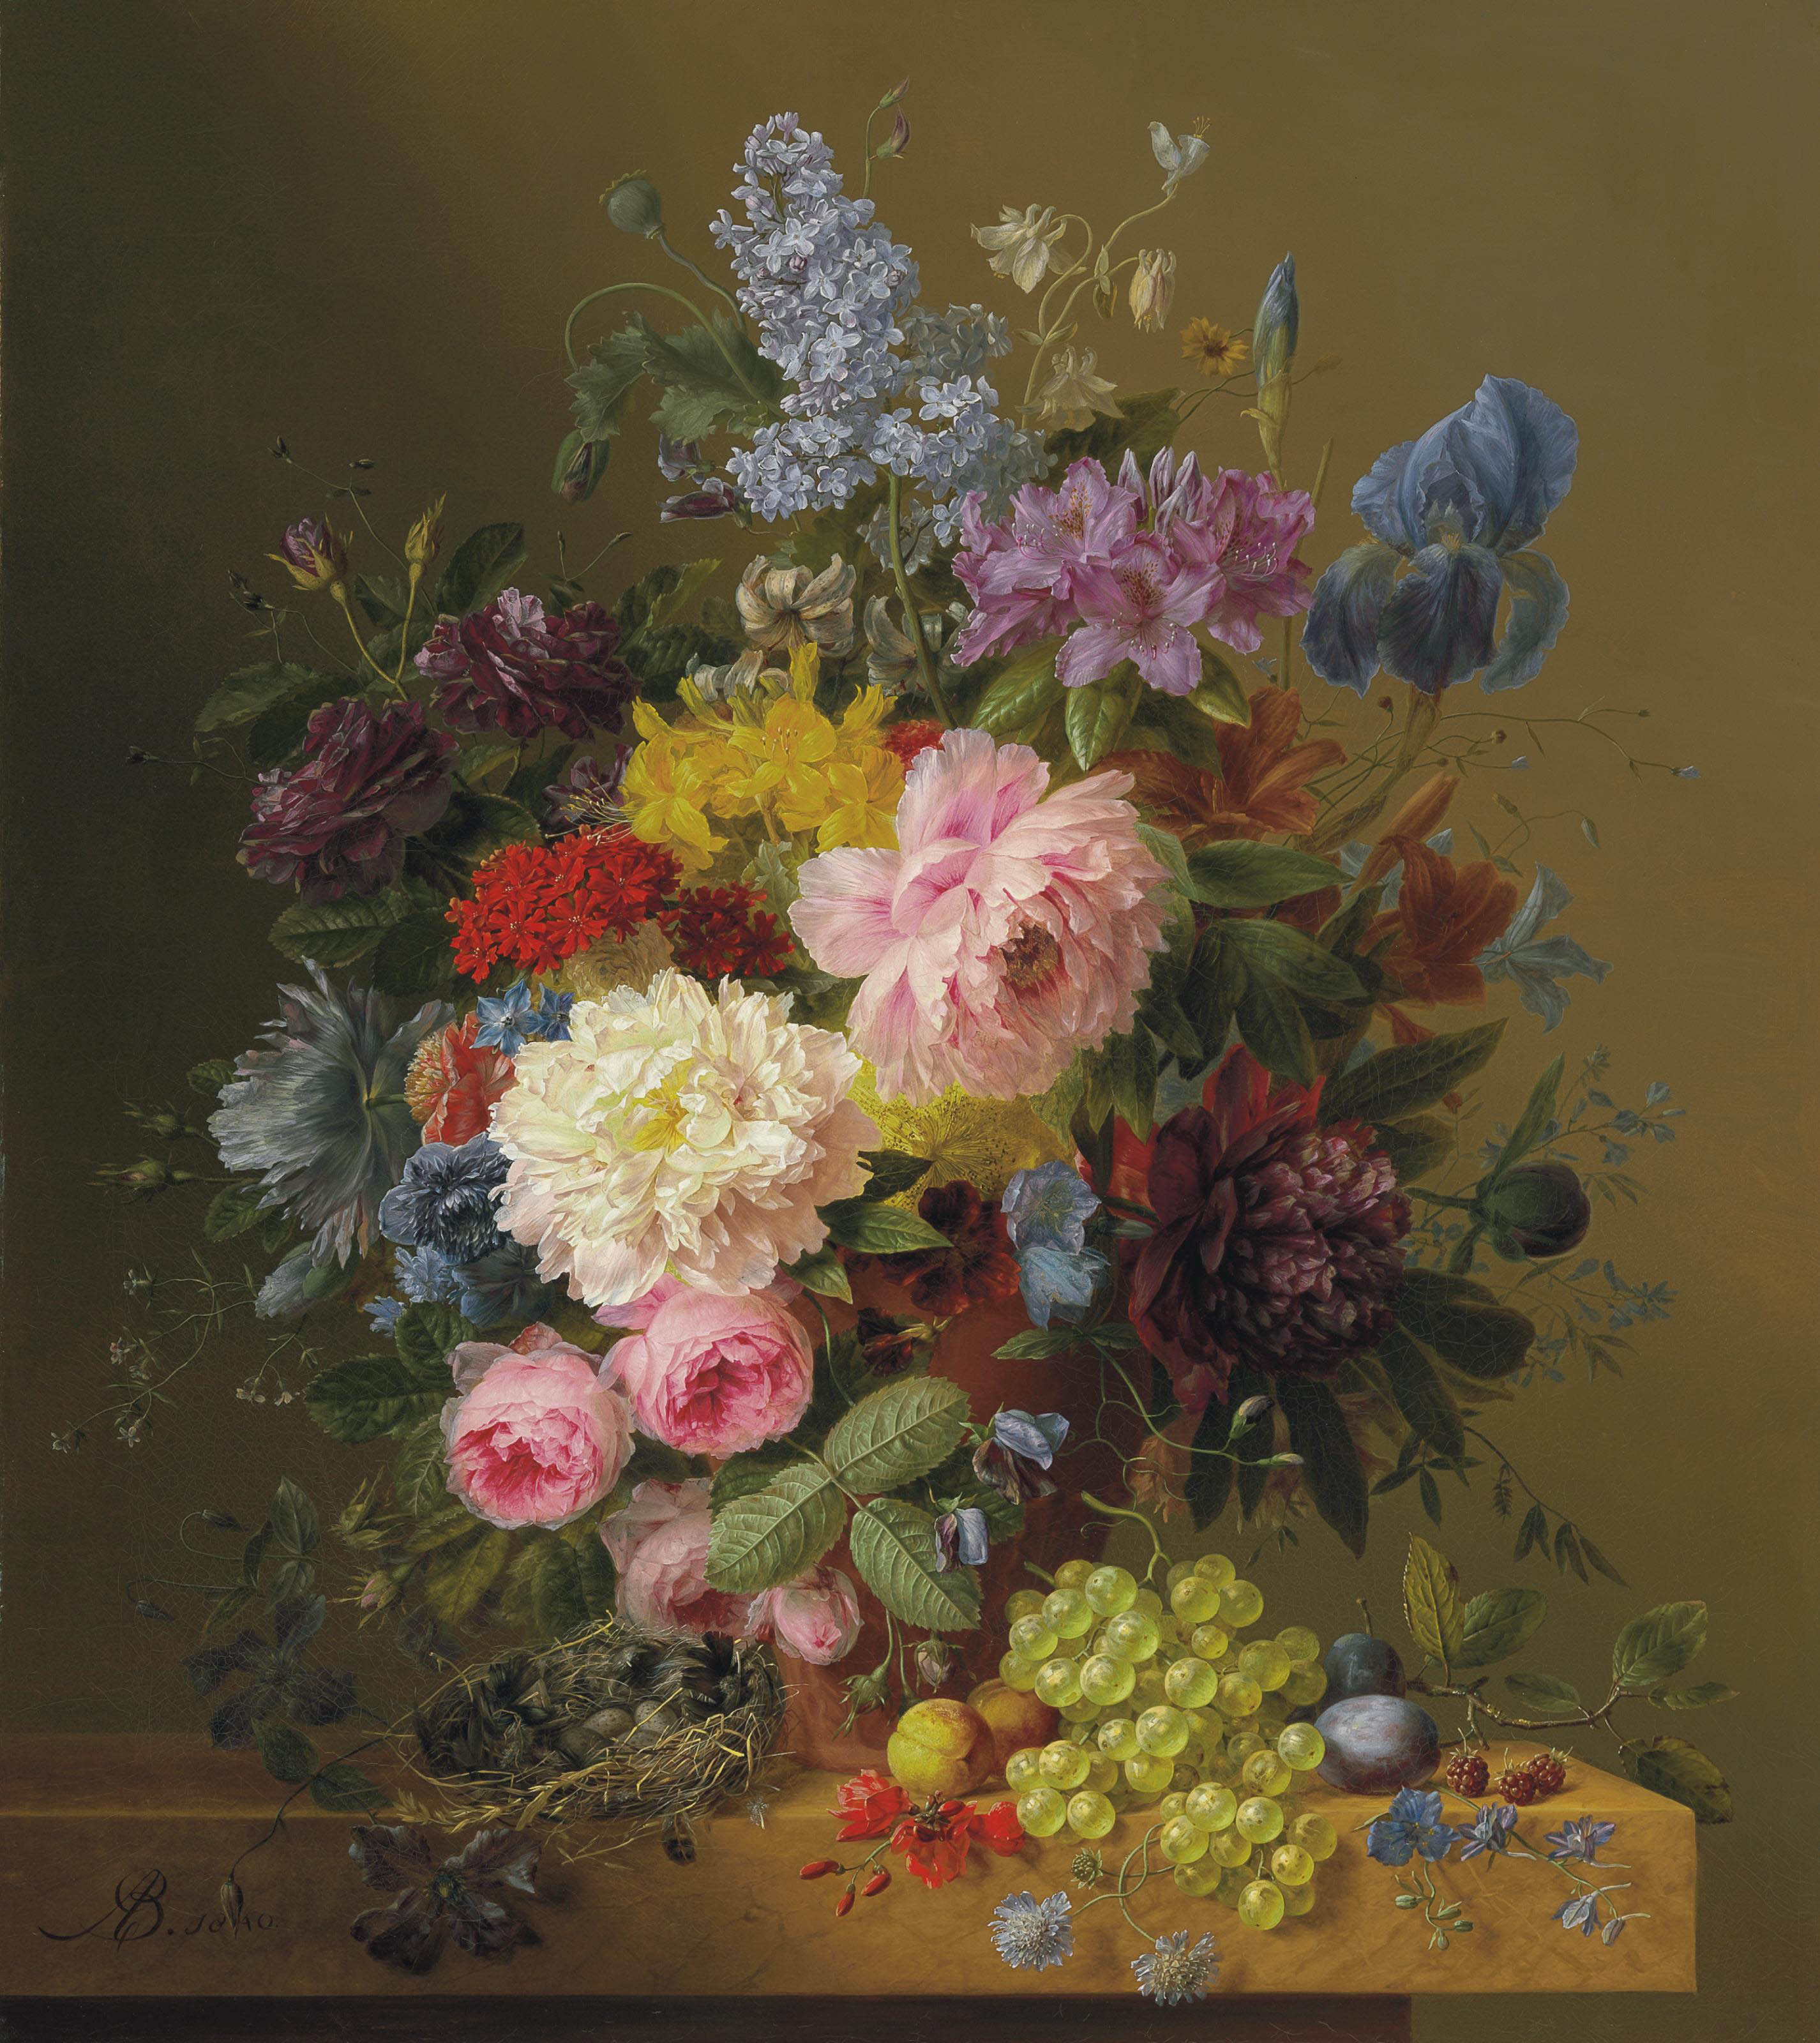 Arnoldus Bloemers (Dutch, 1786-1844)